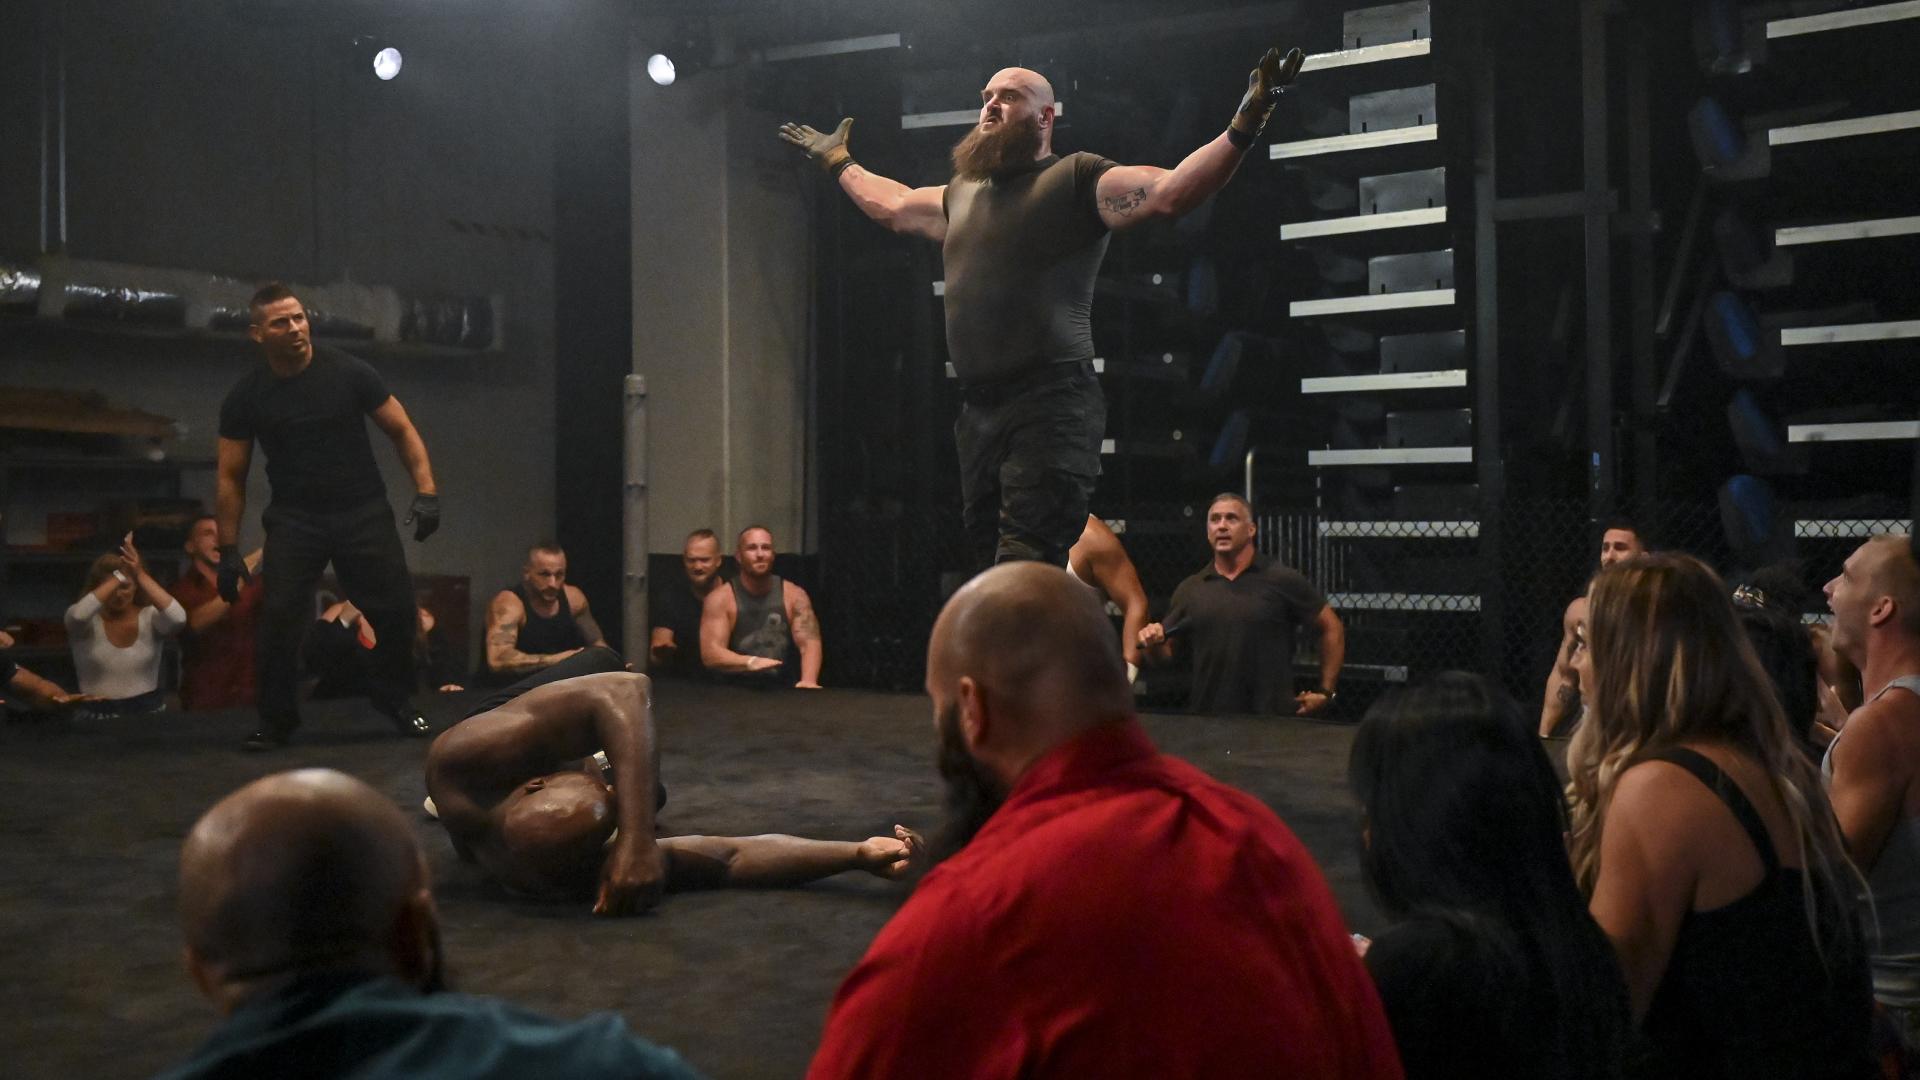 Braun Strowman aparece no RAW Underground e enfrentará Dabba-Kato na próxima semana